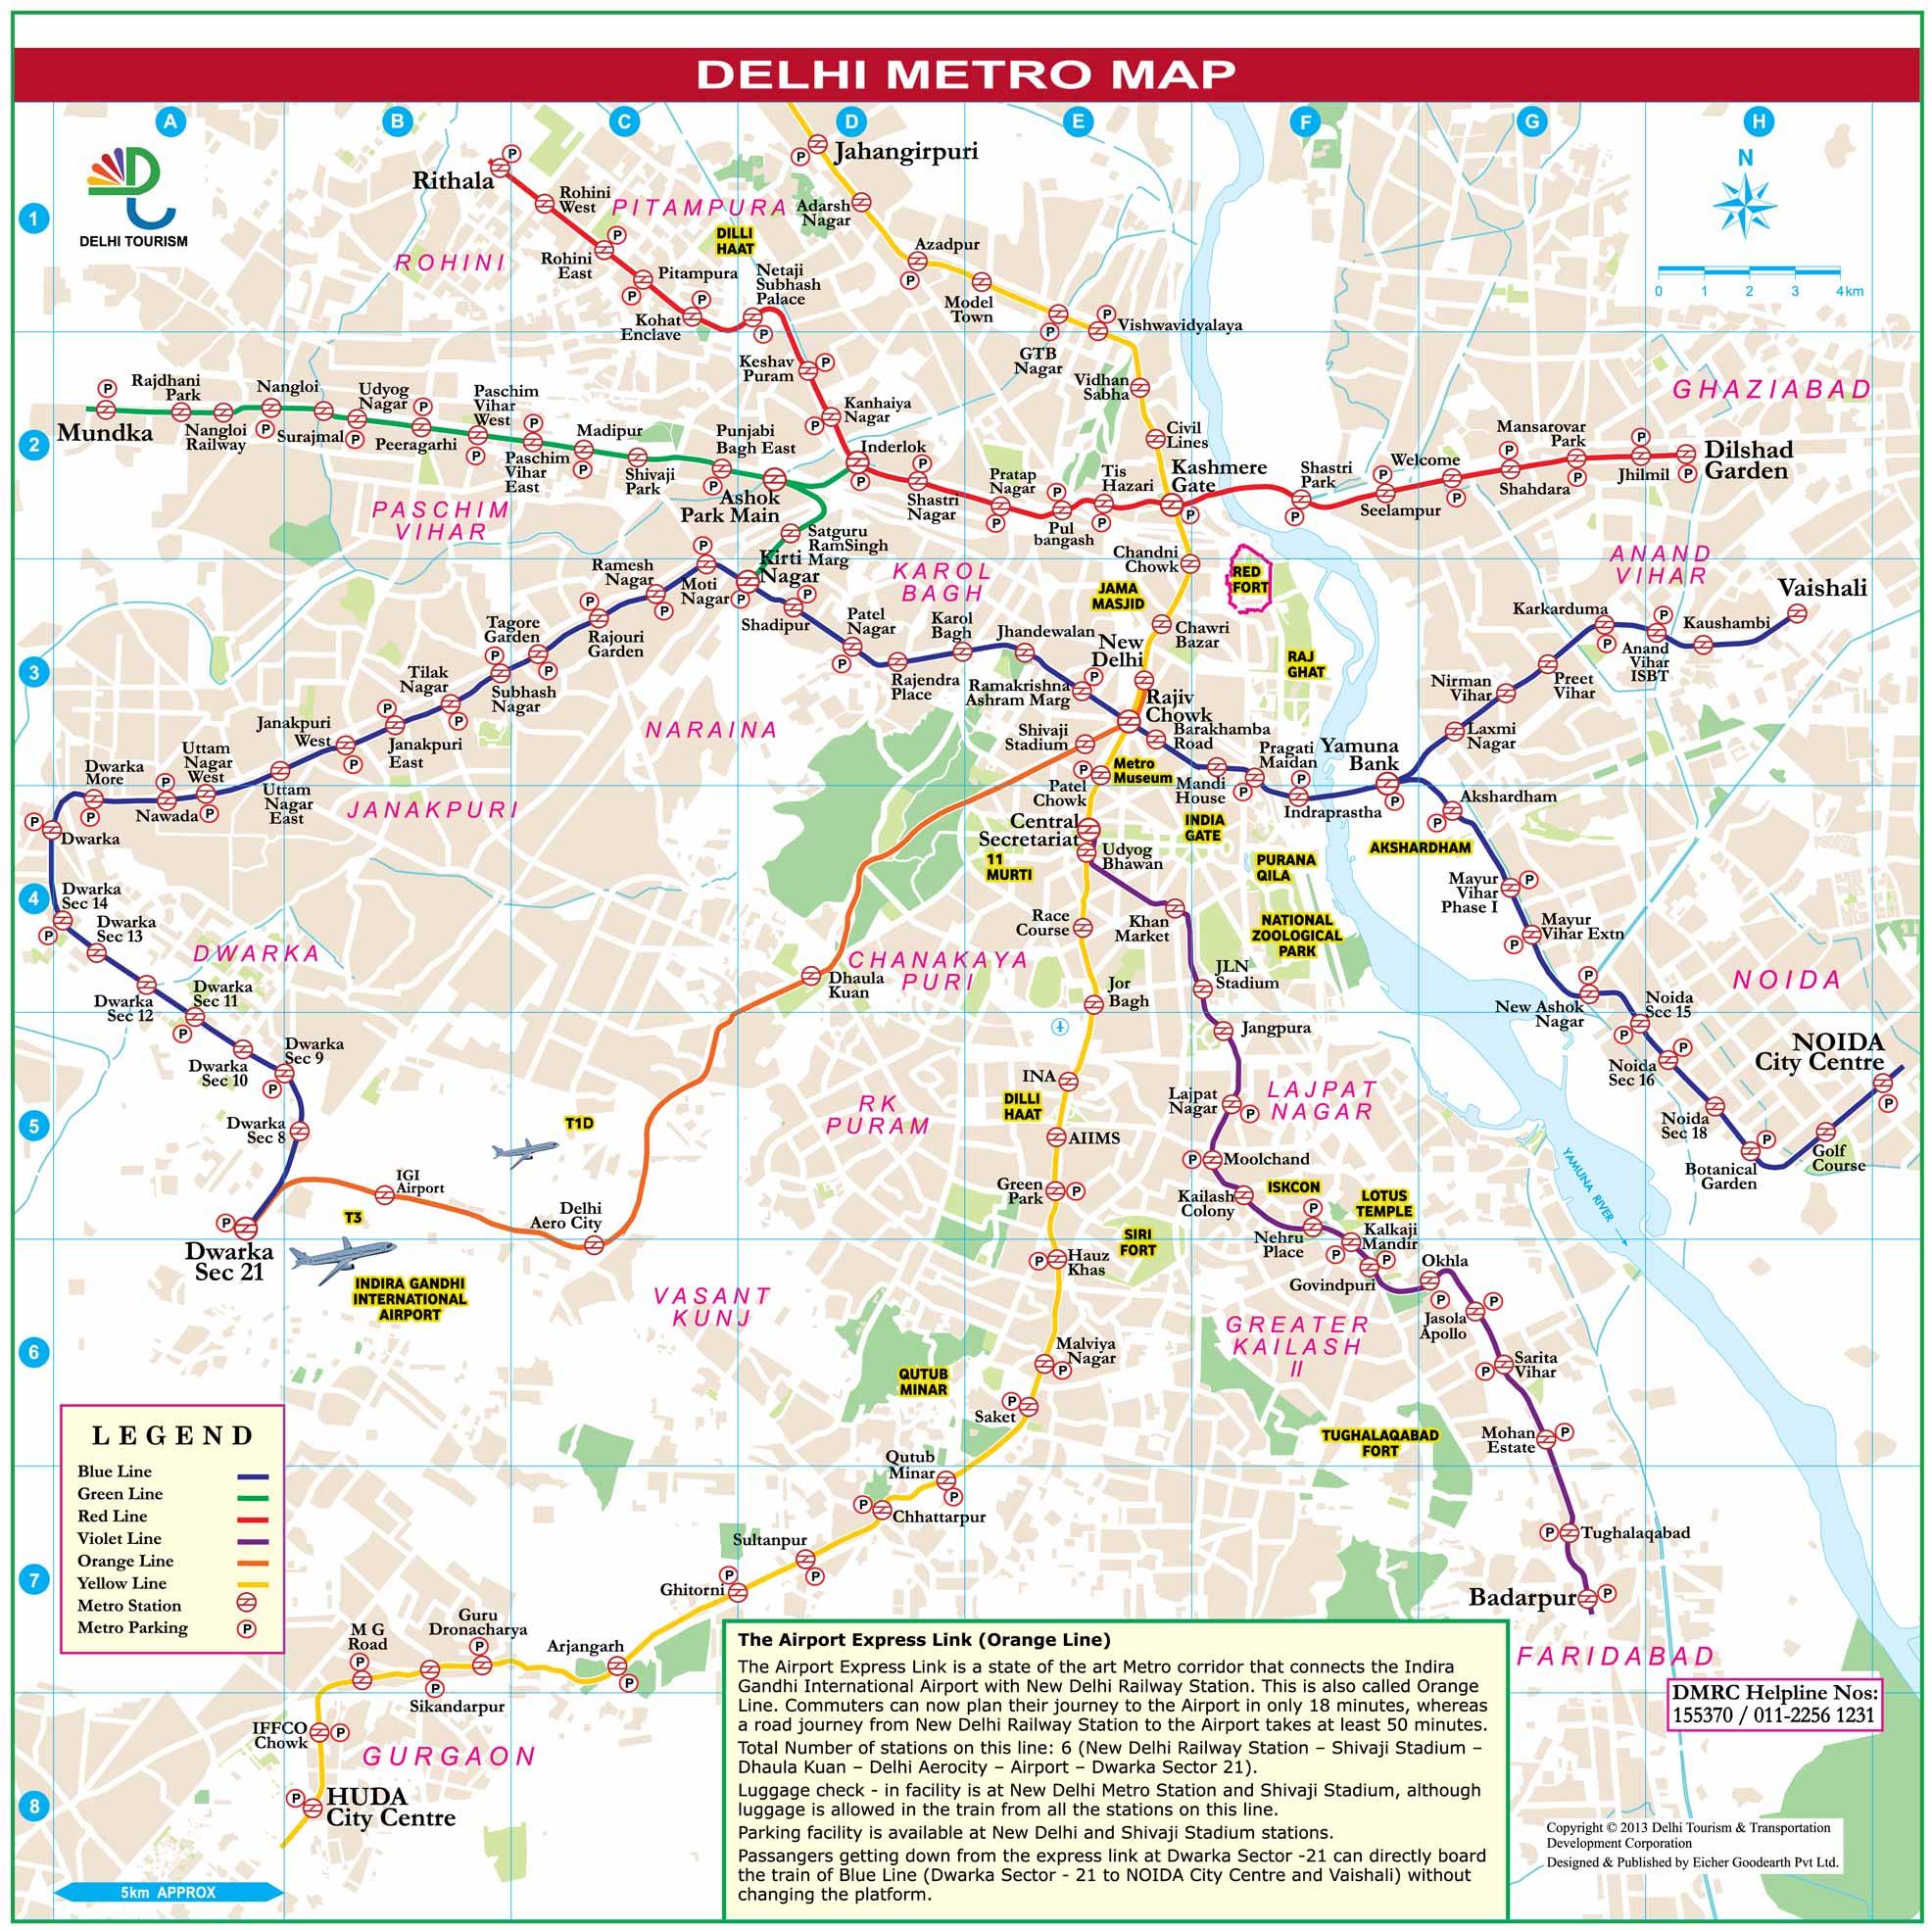 Paris Metro Map With Monuments.Maps Of Delhi